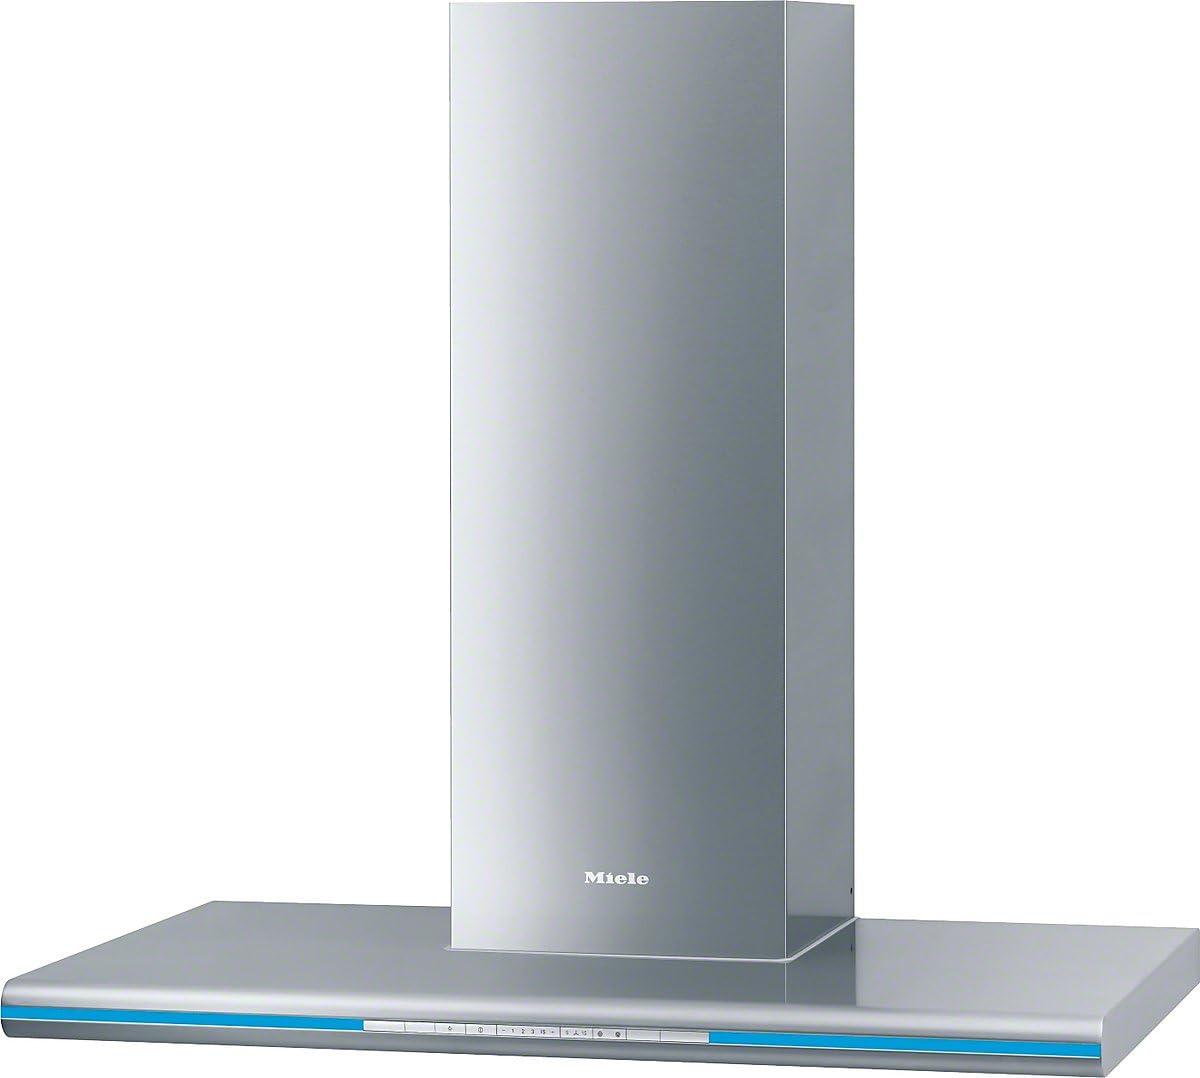 Miele DA 6296 W - Campana (640 m³/h, Canalizado/Recirculación, 490 m³/h, 51 dB, 64 dB, 71 dB): Amazon.es: Hogar